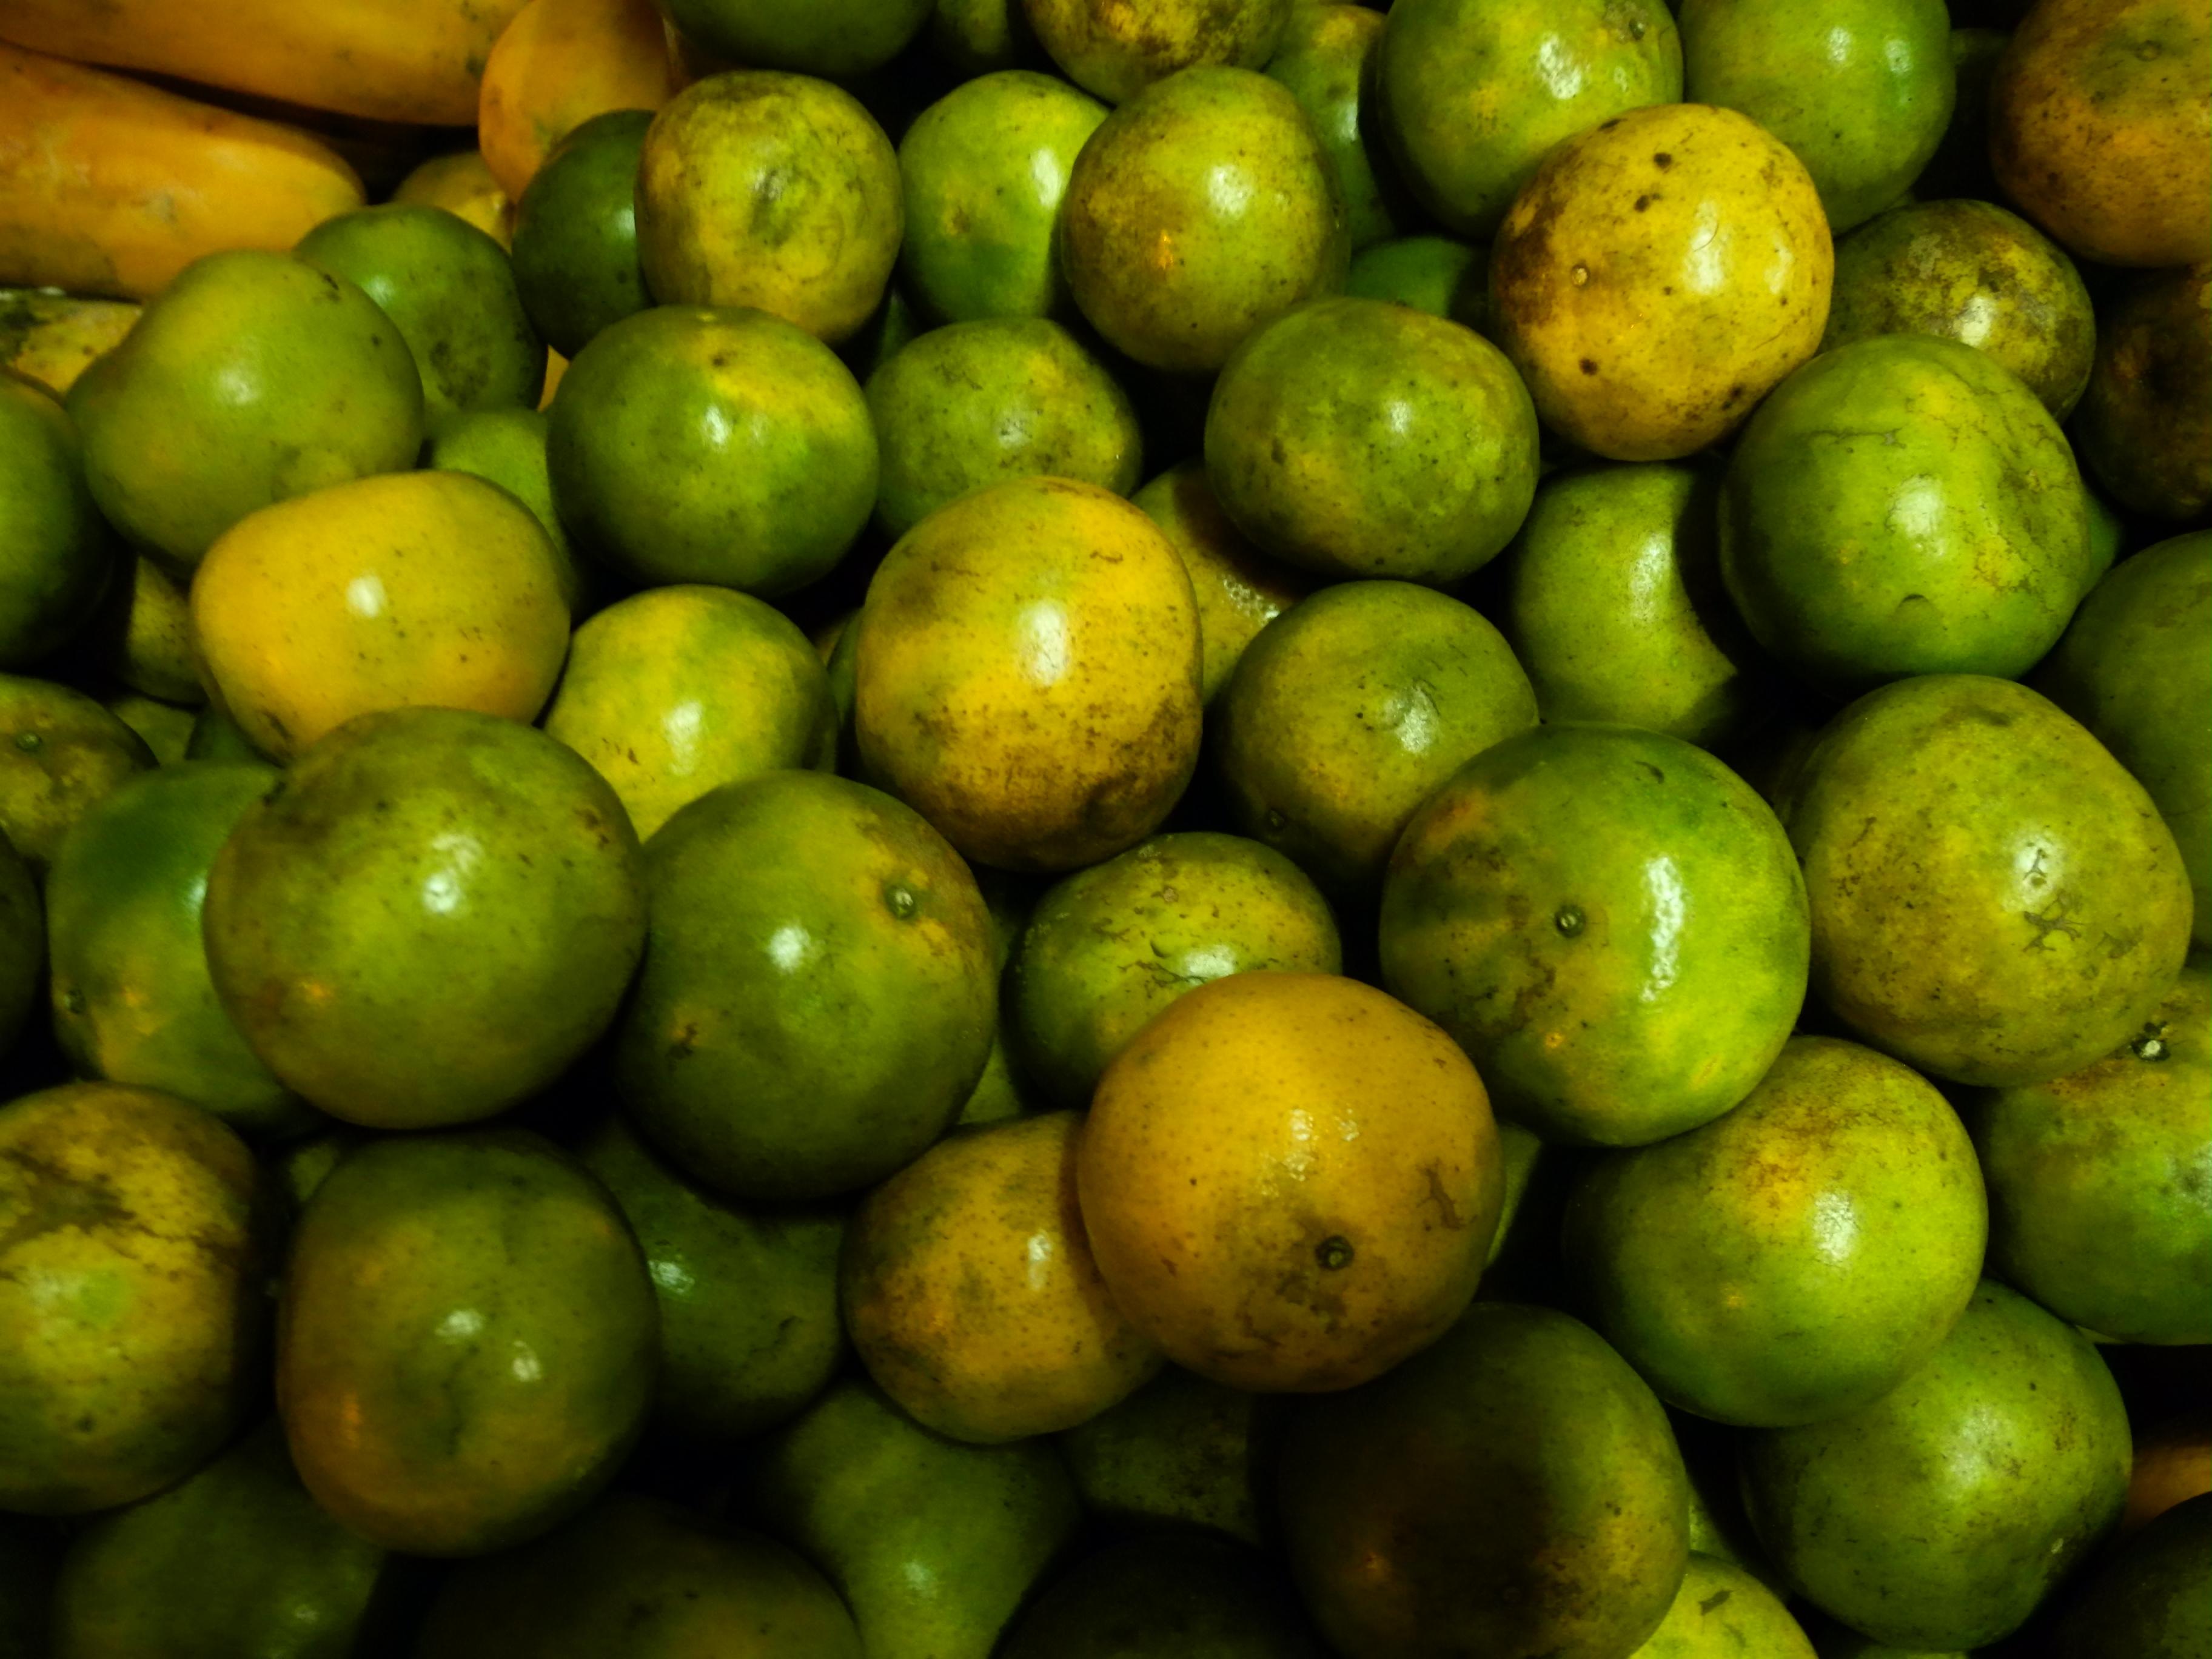 Orange Limes